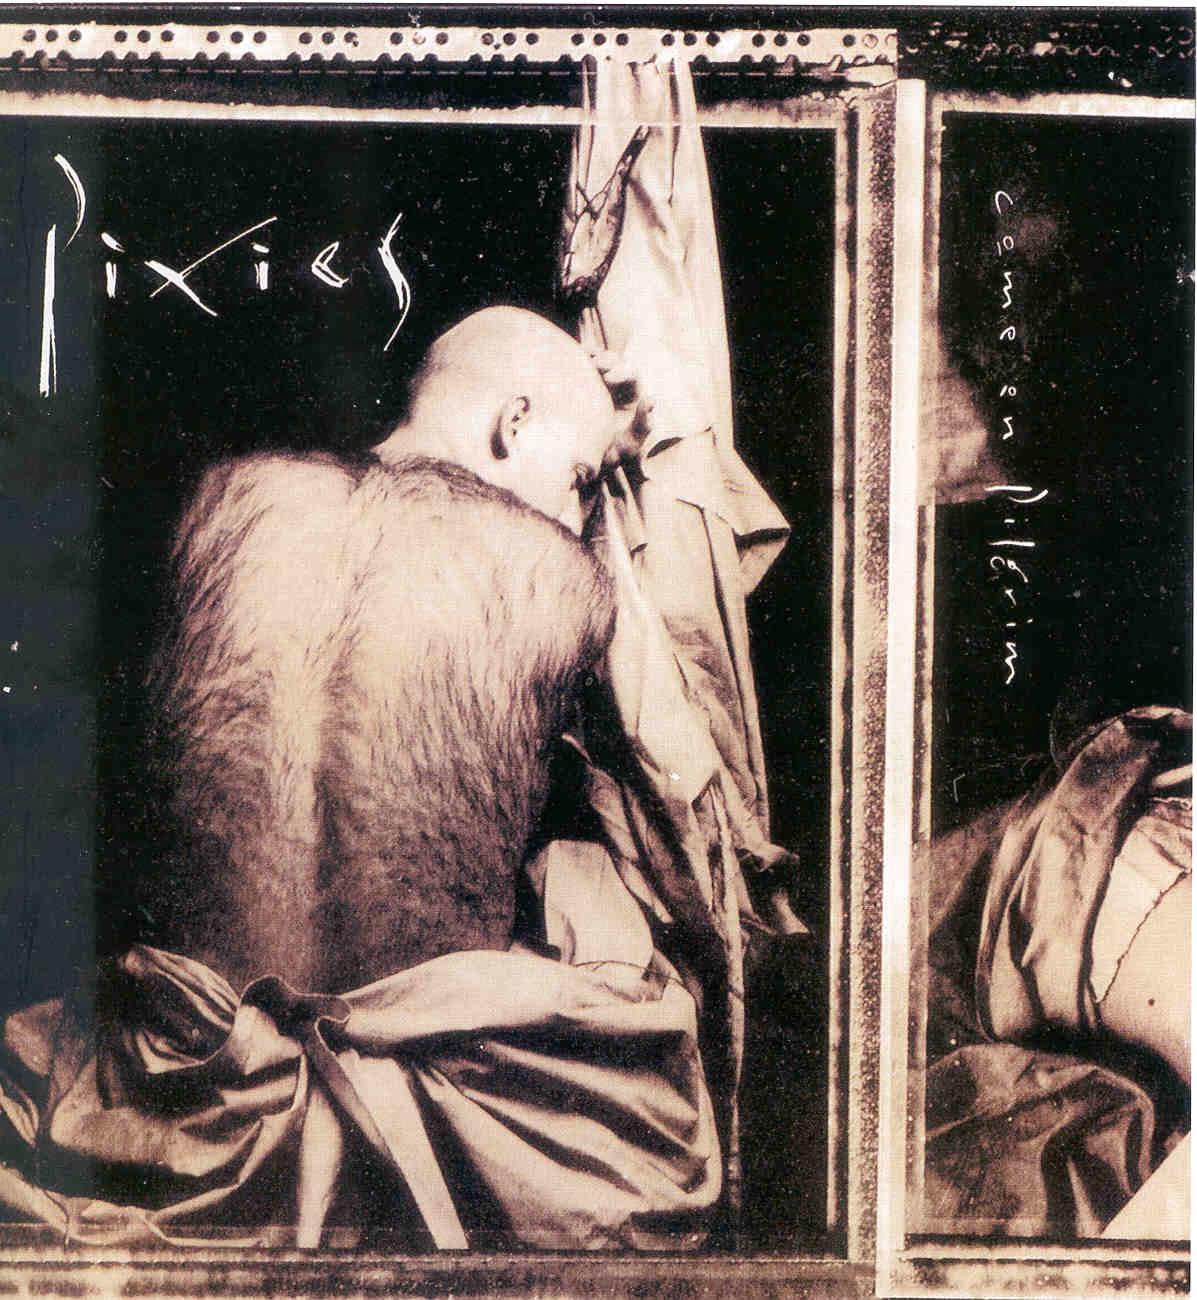 Pixies Doolittle Rar Zip Freeware - bustervegalo